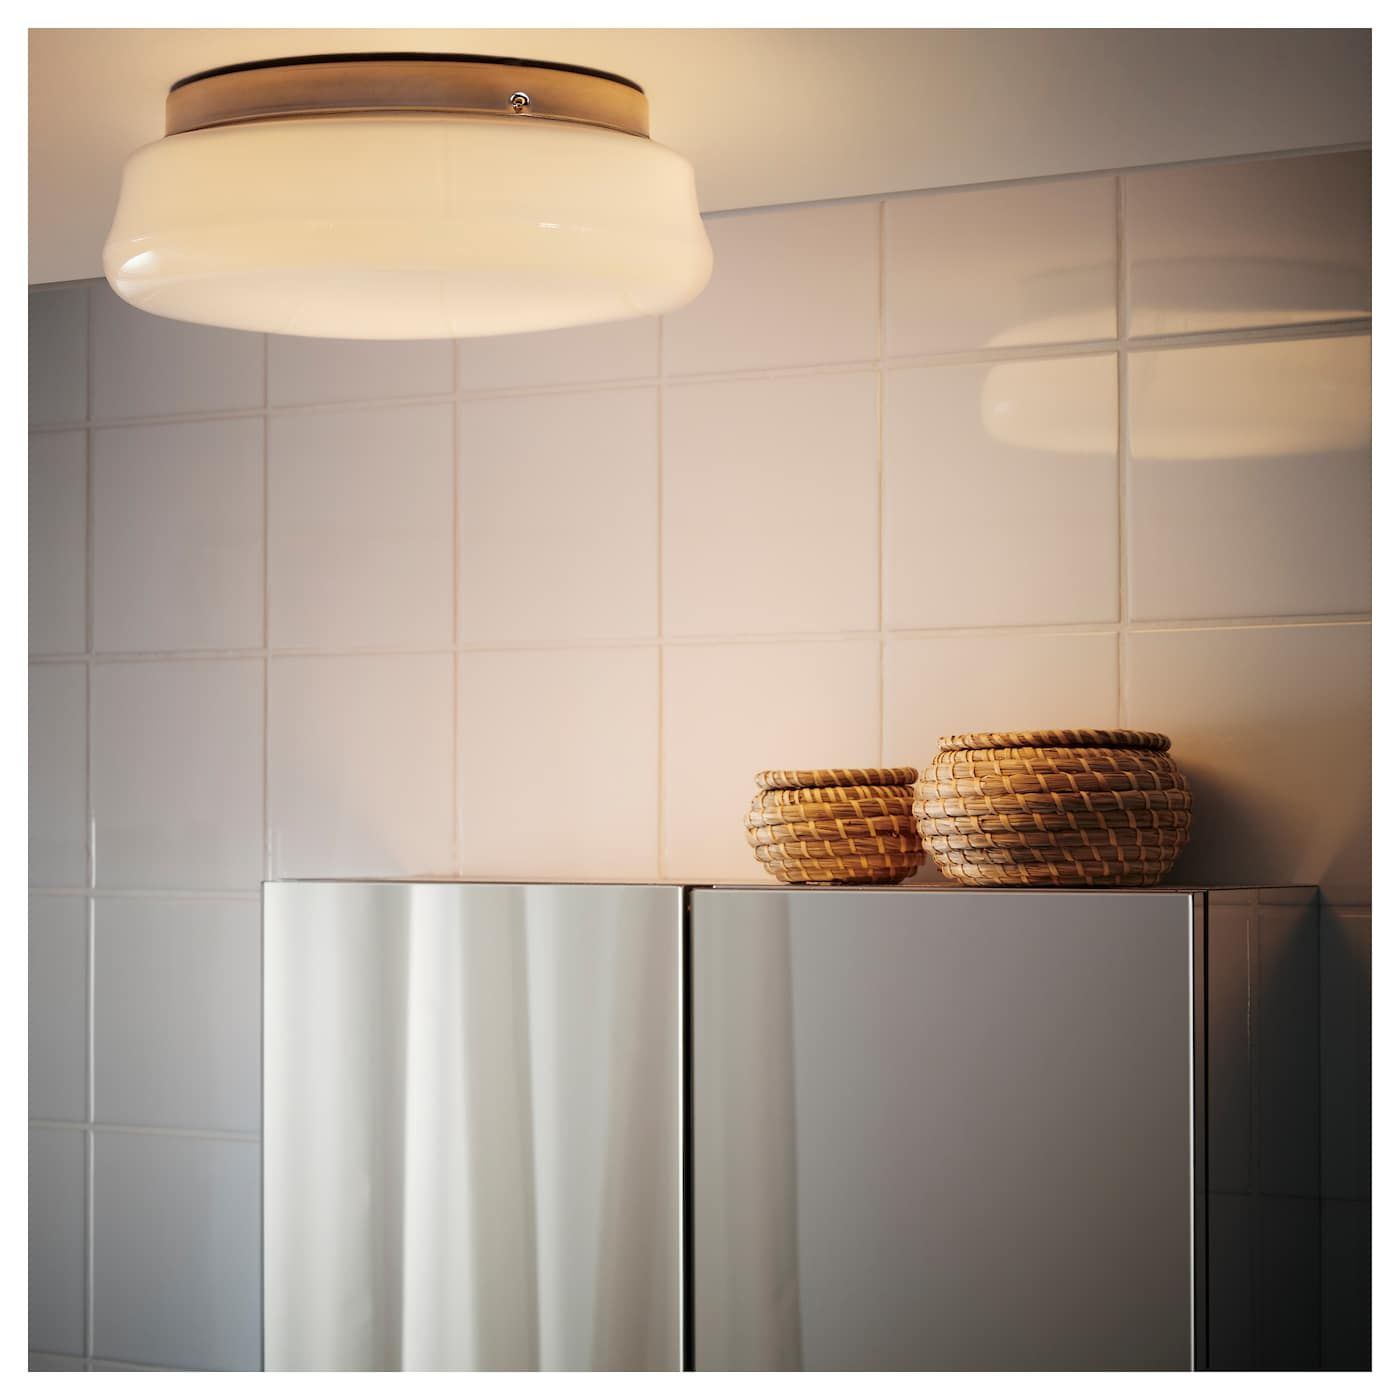 Ikea Nabytek A Vybaveni Pro Domacnosti A Kancelare Ceiling Lamp Lamp Ikea